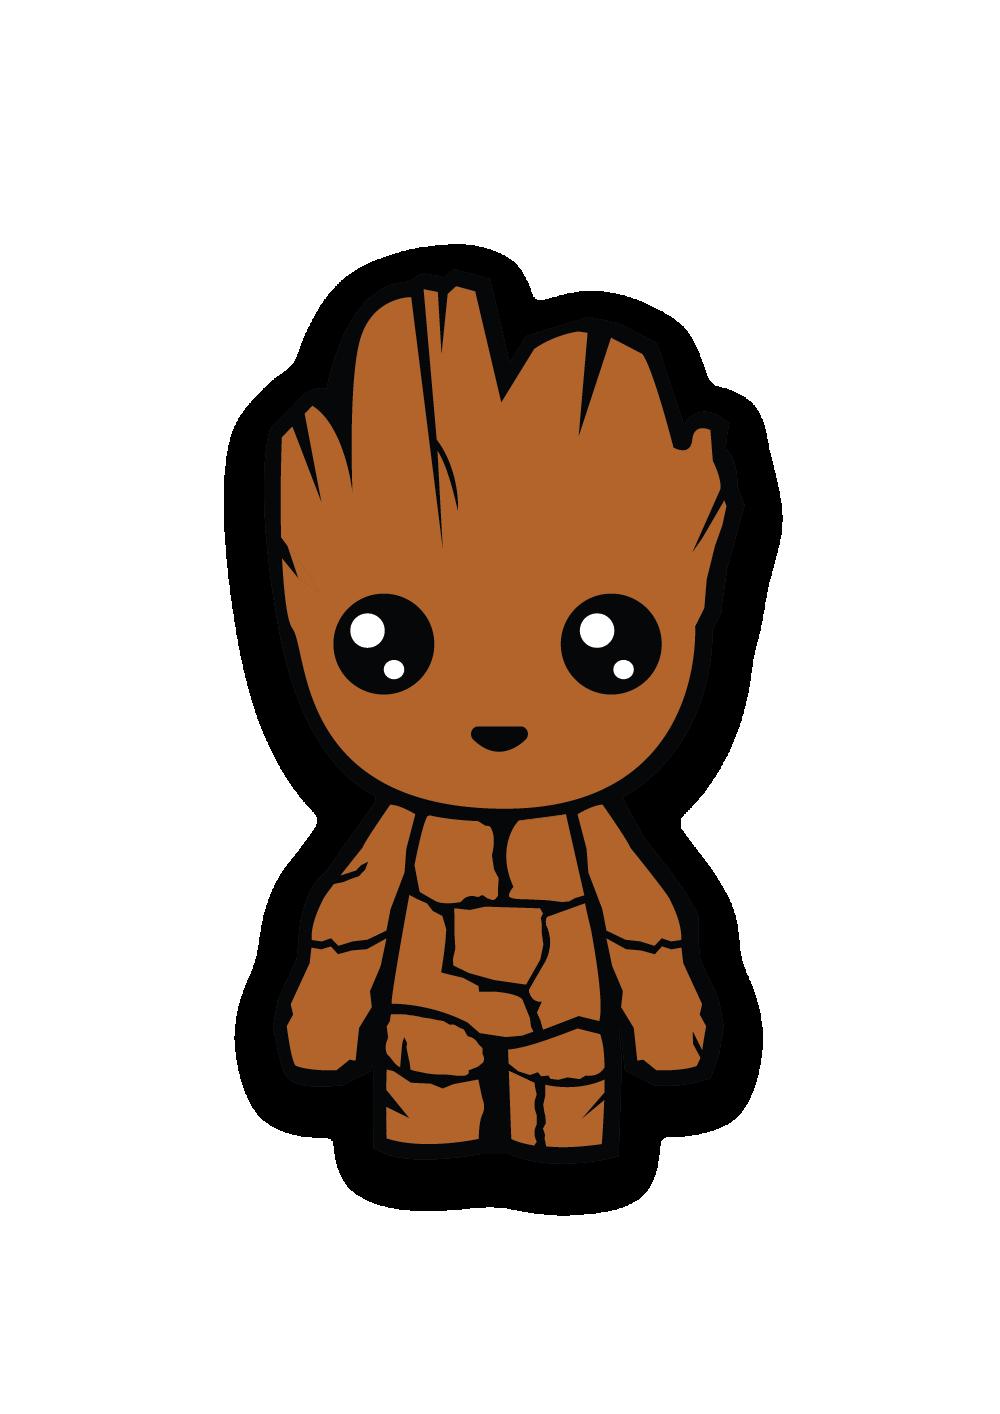 Groot at getdrawings com. Clipart baby cross